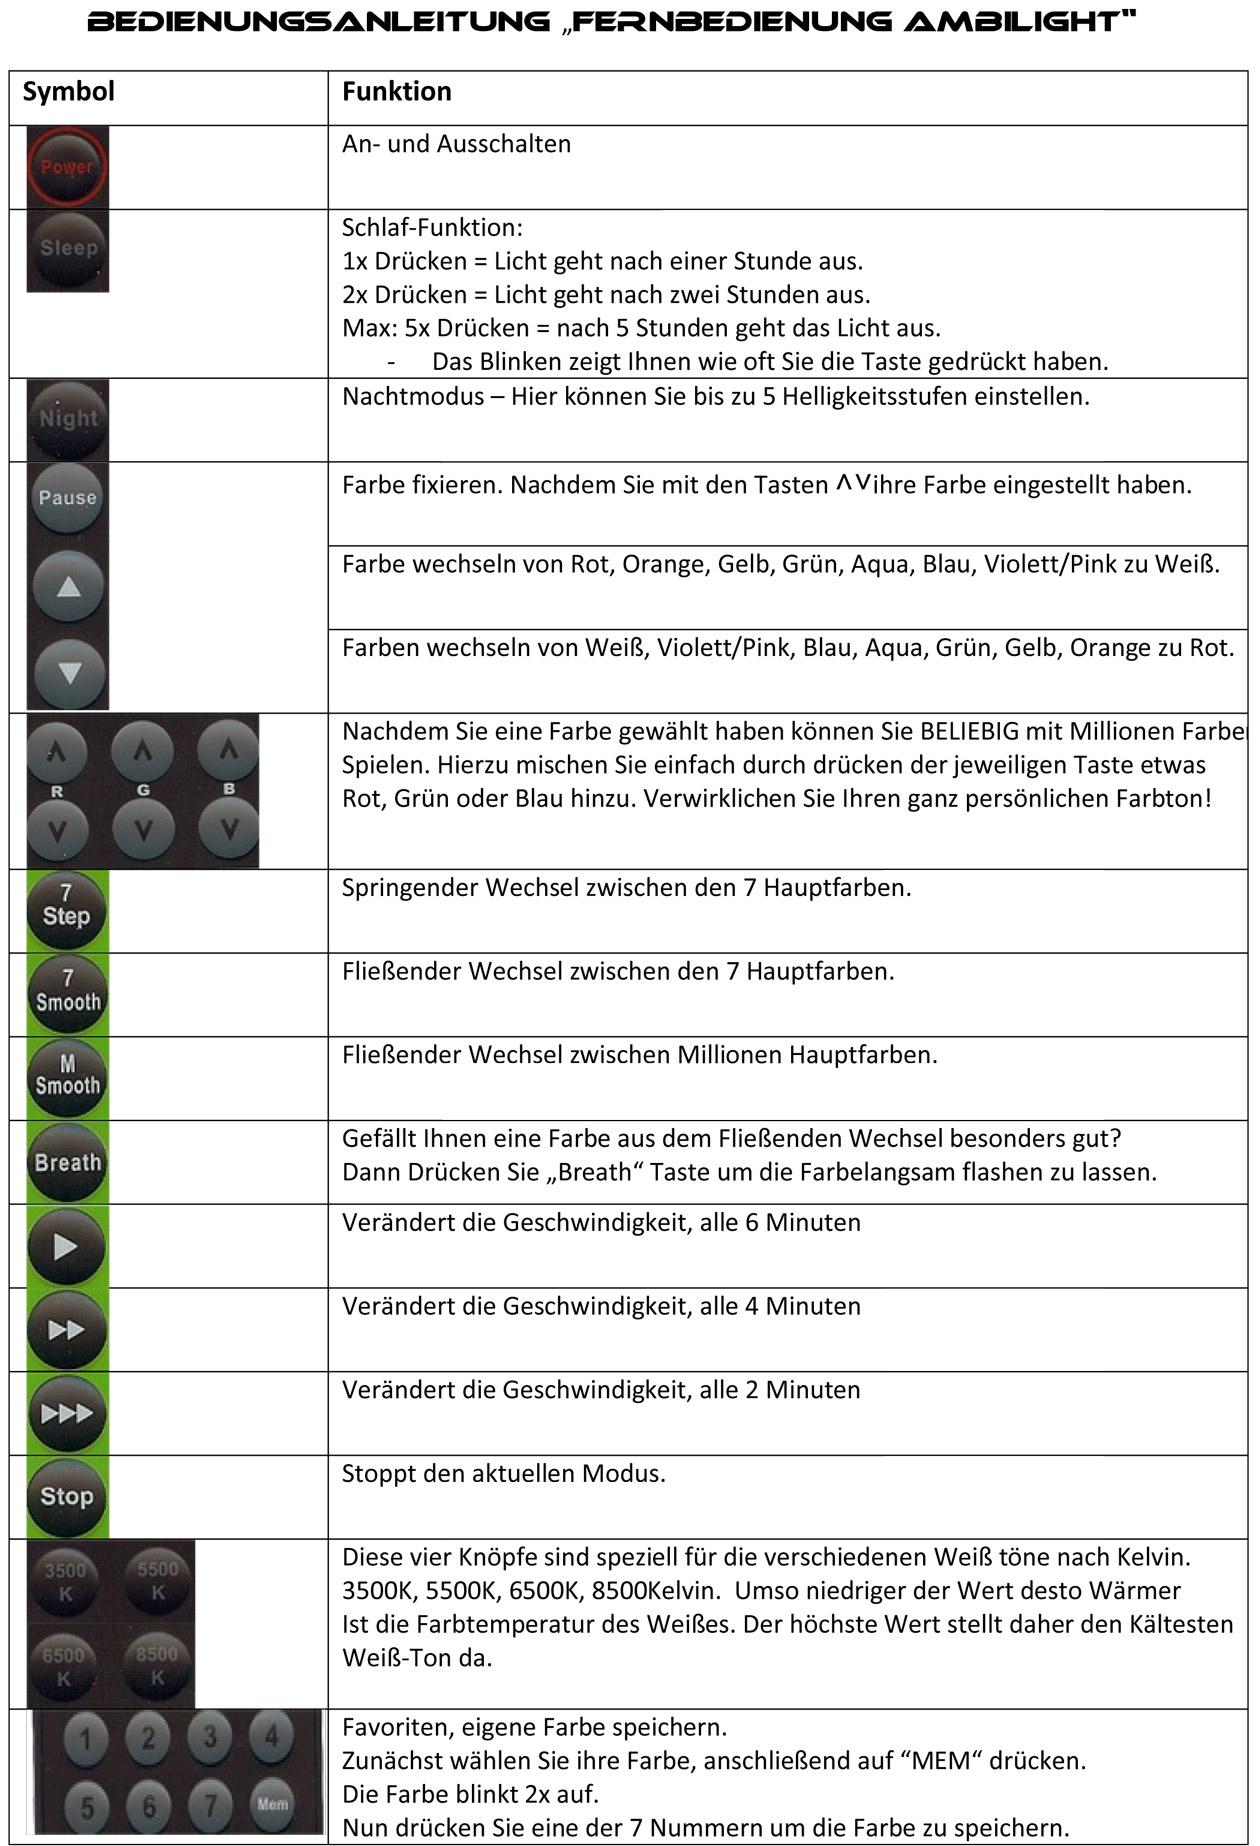 hilfe alternative zu ikea dioder da jetzt 50 lcd fernseher hifi forum seite 12. Black Bedroom Furniture Sets. Home Design Ideas